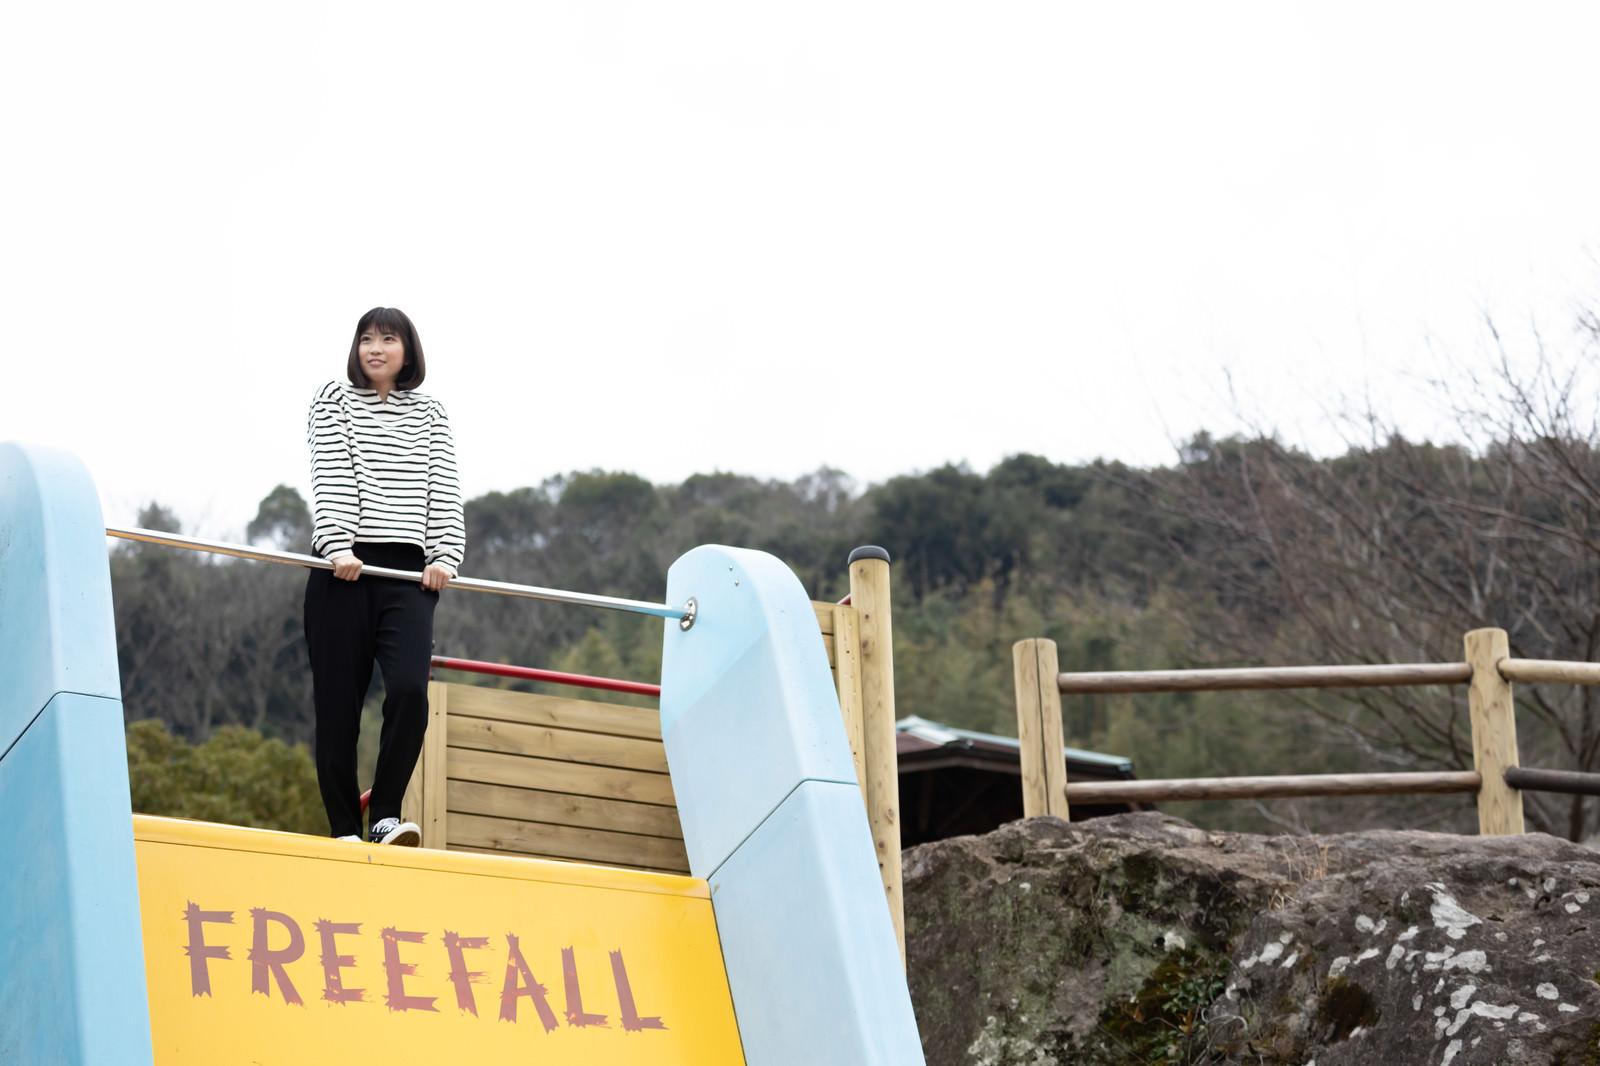 「FREE FALL(時津町、文化の森公園)」の写真[モデル:塩田みう]